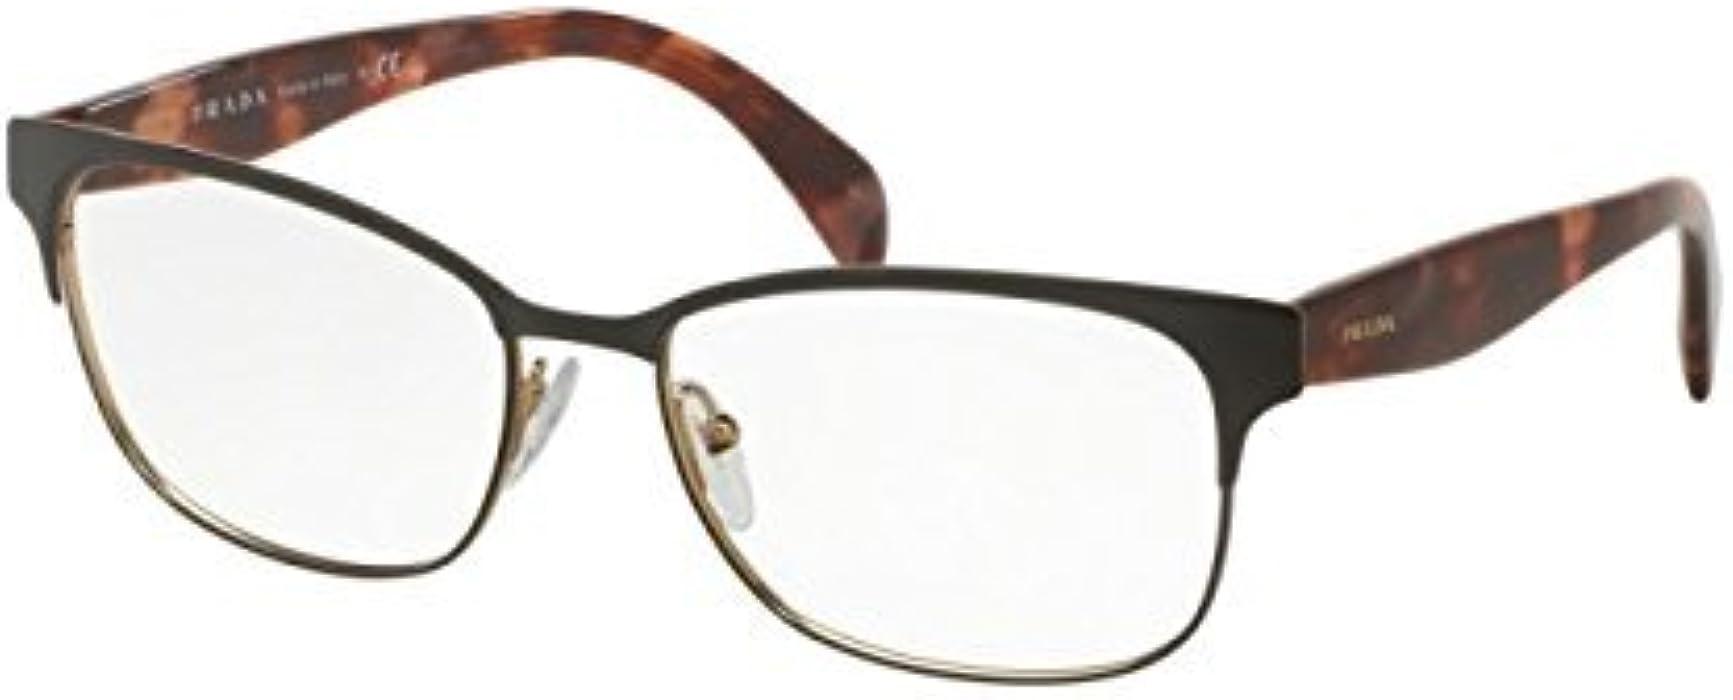 2f58fda5edf4 Prada PR65RV Eyeglass Frames UE01O1-55 - Brown Pale Gold PR65RV-UE01O1-